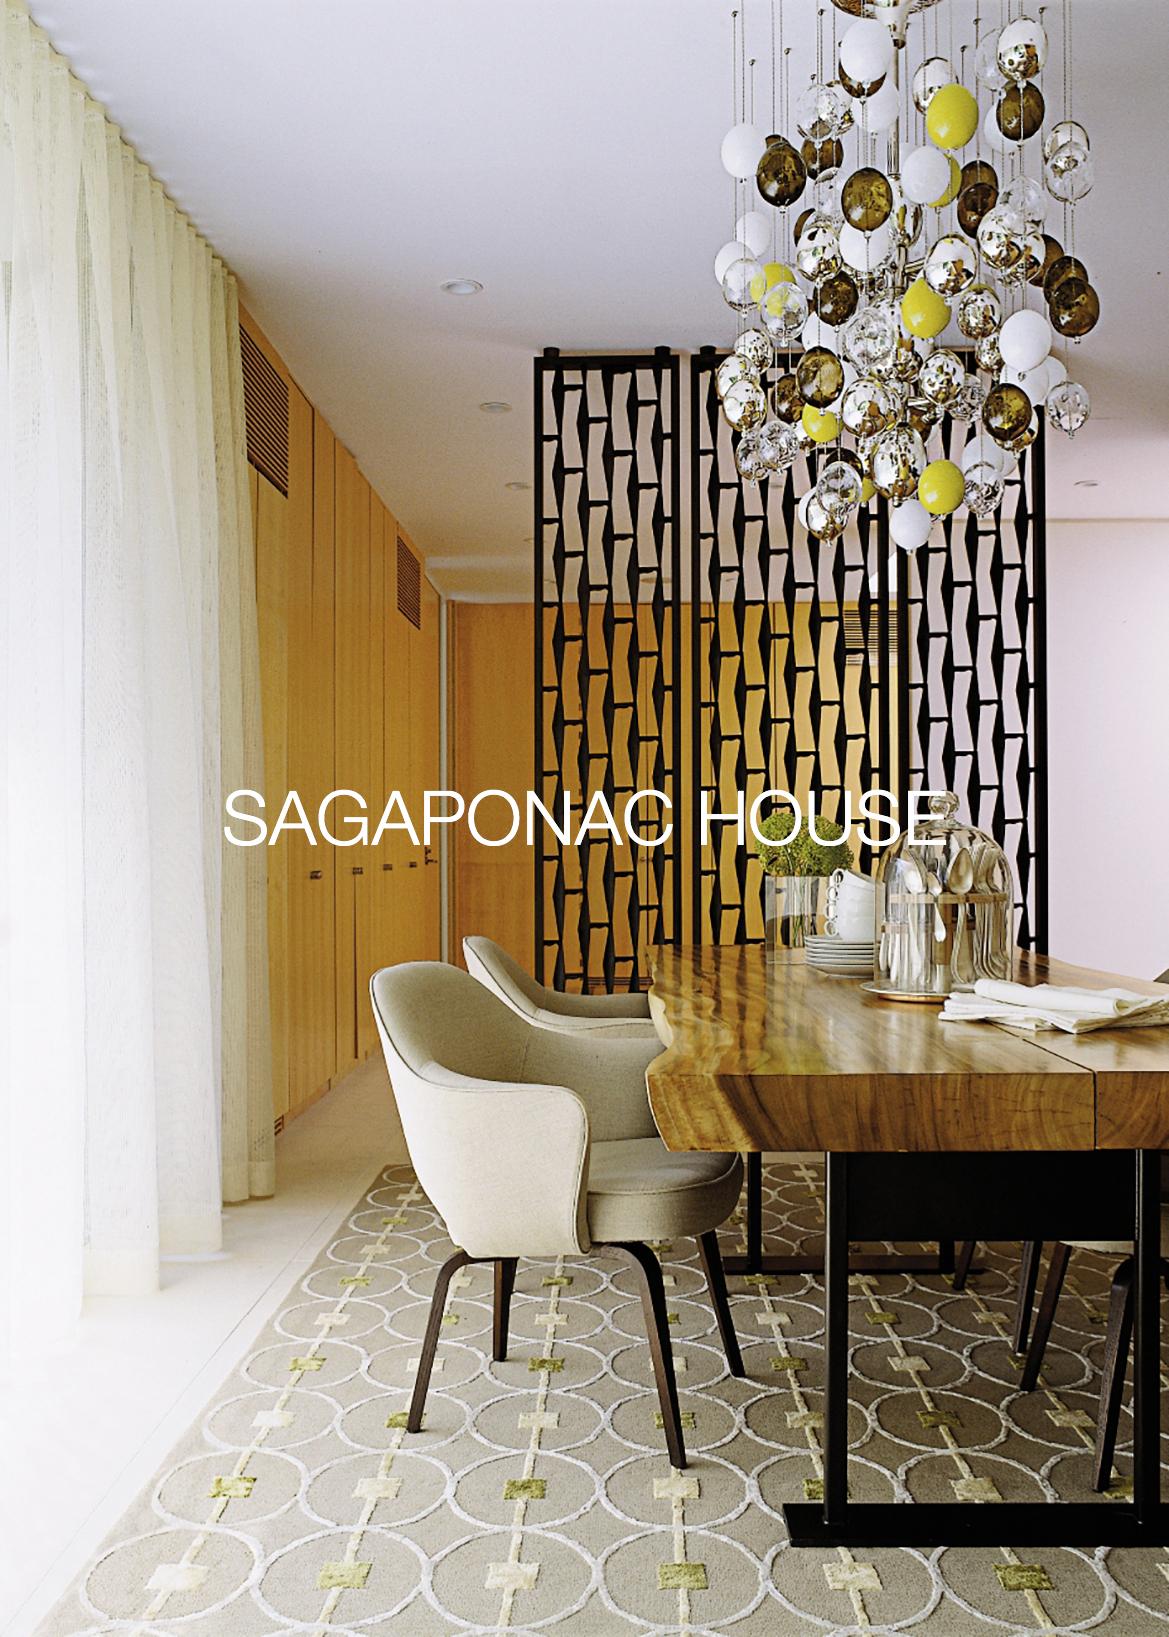 Sagaponic House.jpg